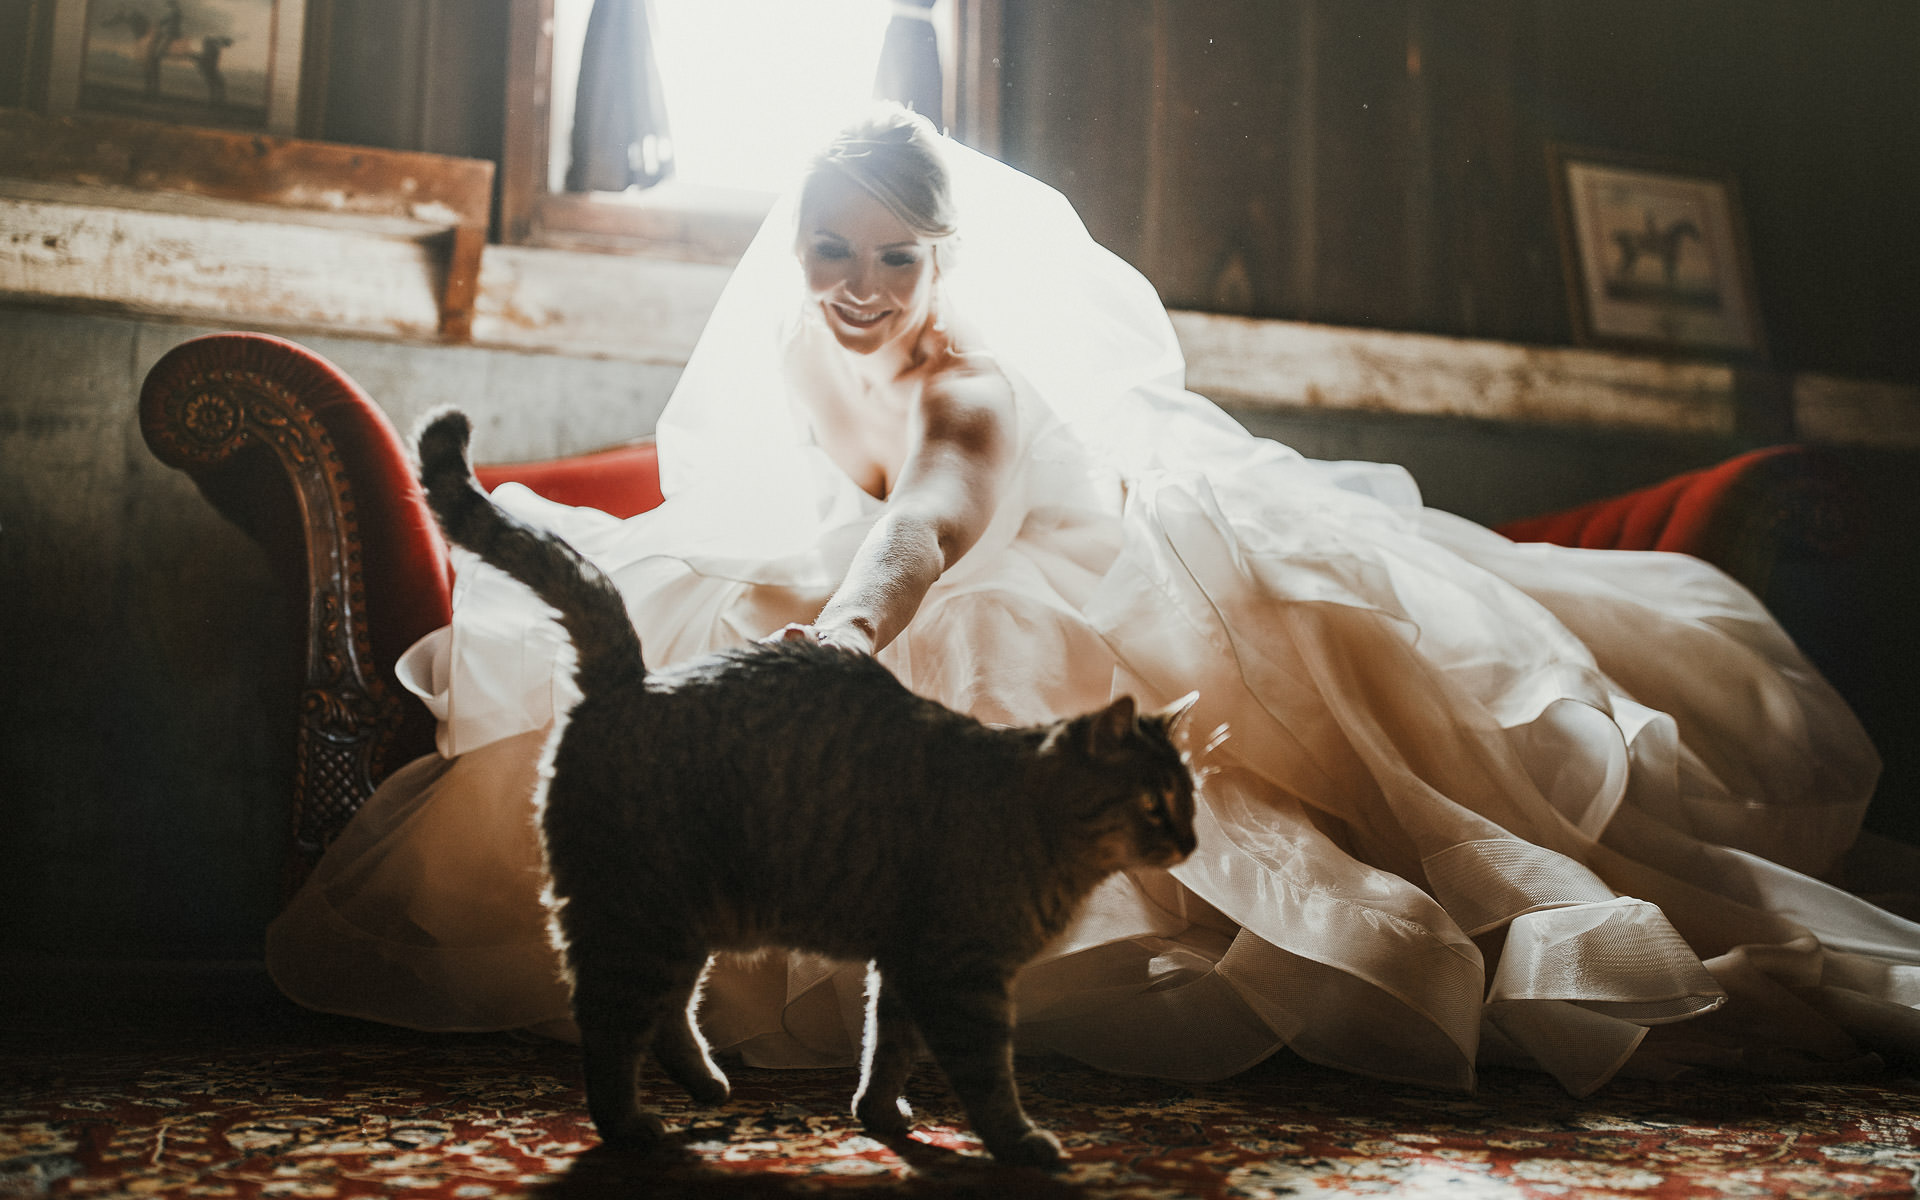 Twisted-oaks-studio-rustic-farm-wedding-0010.jpg